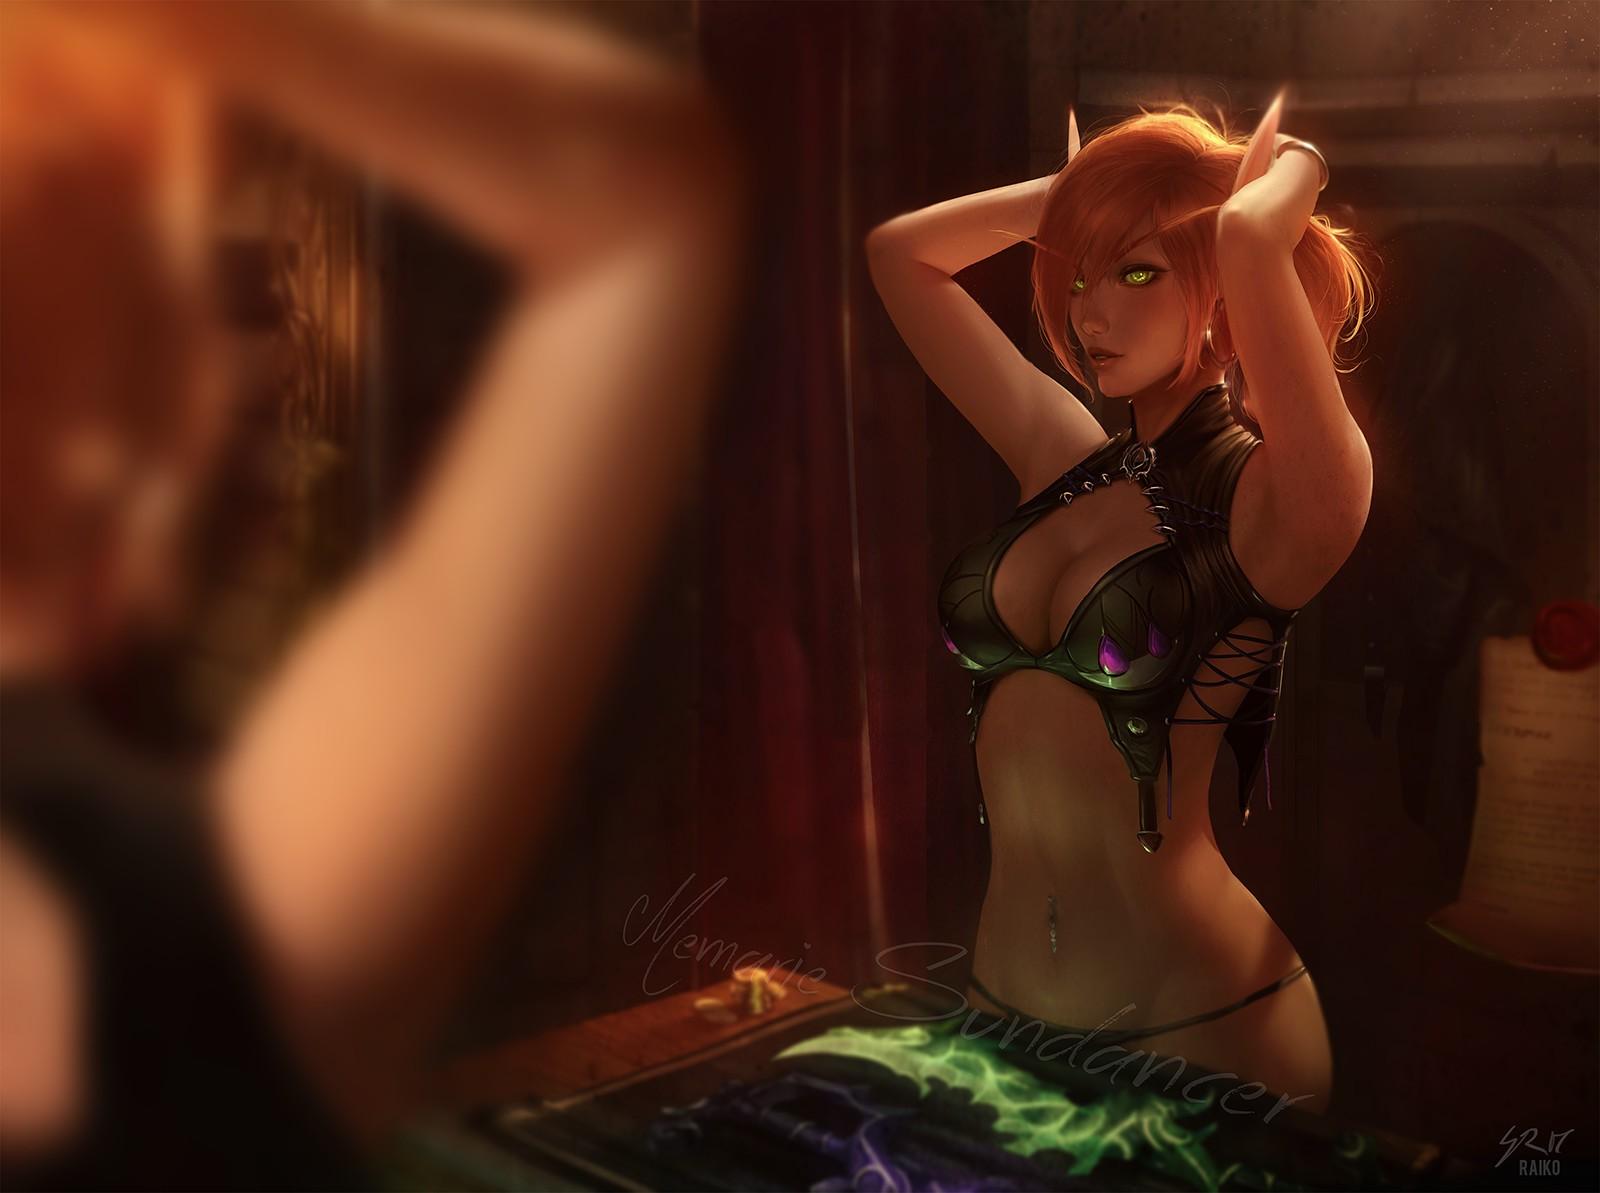 nochnoy-blud-porno